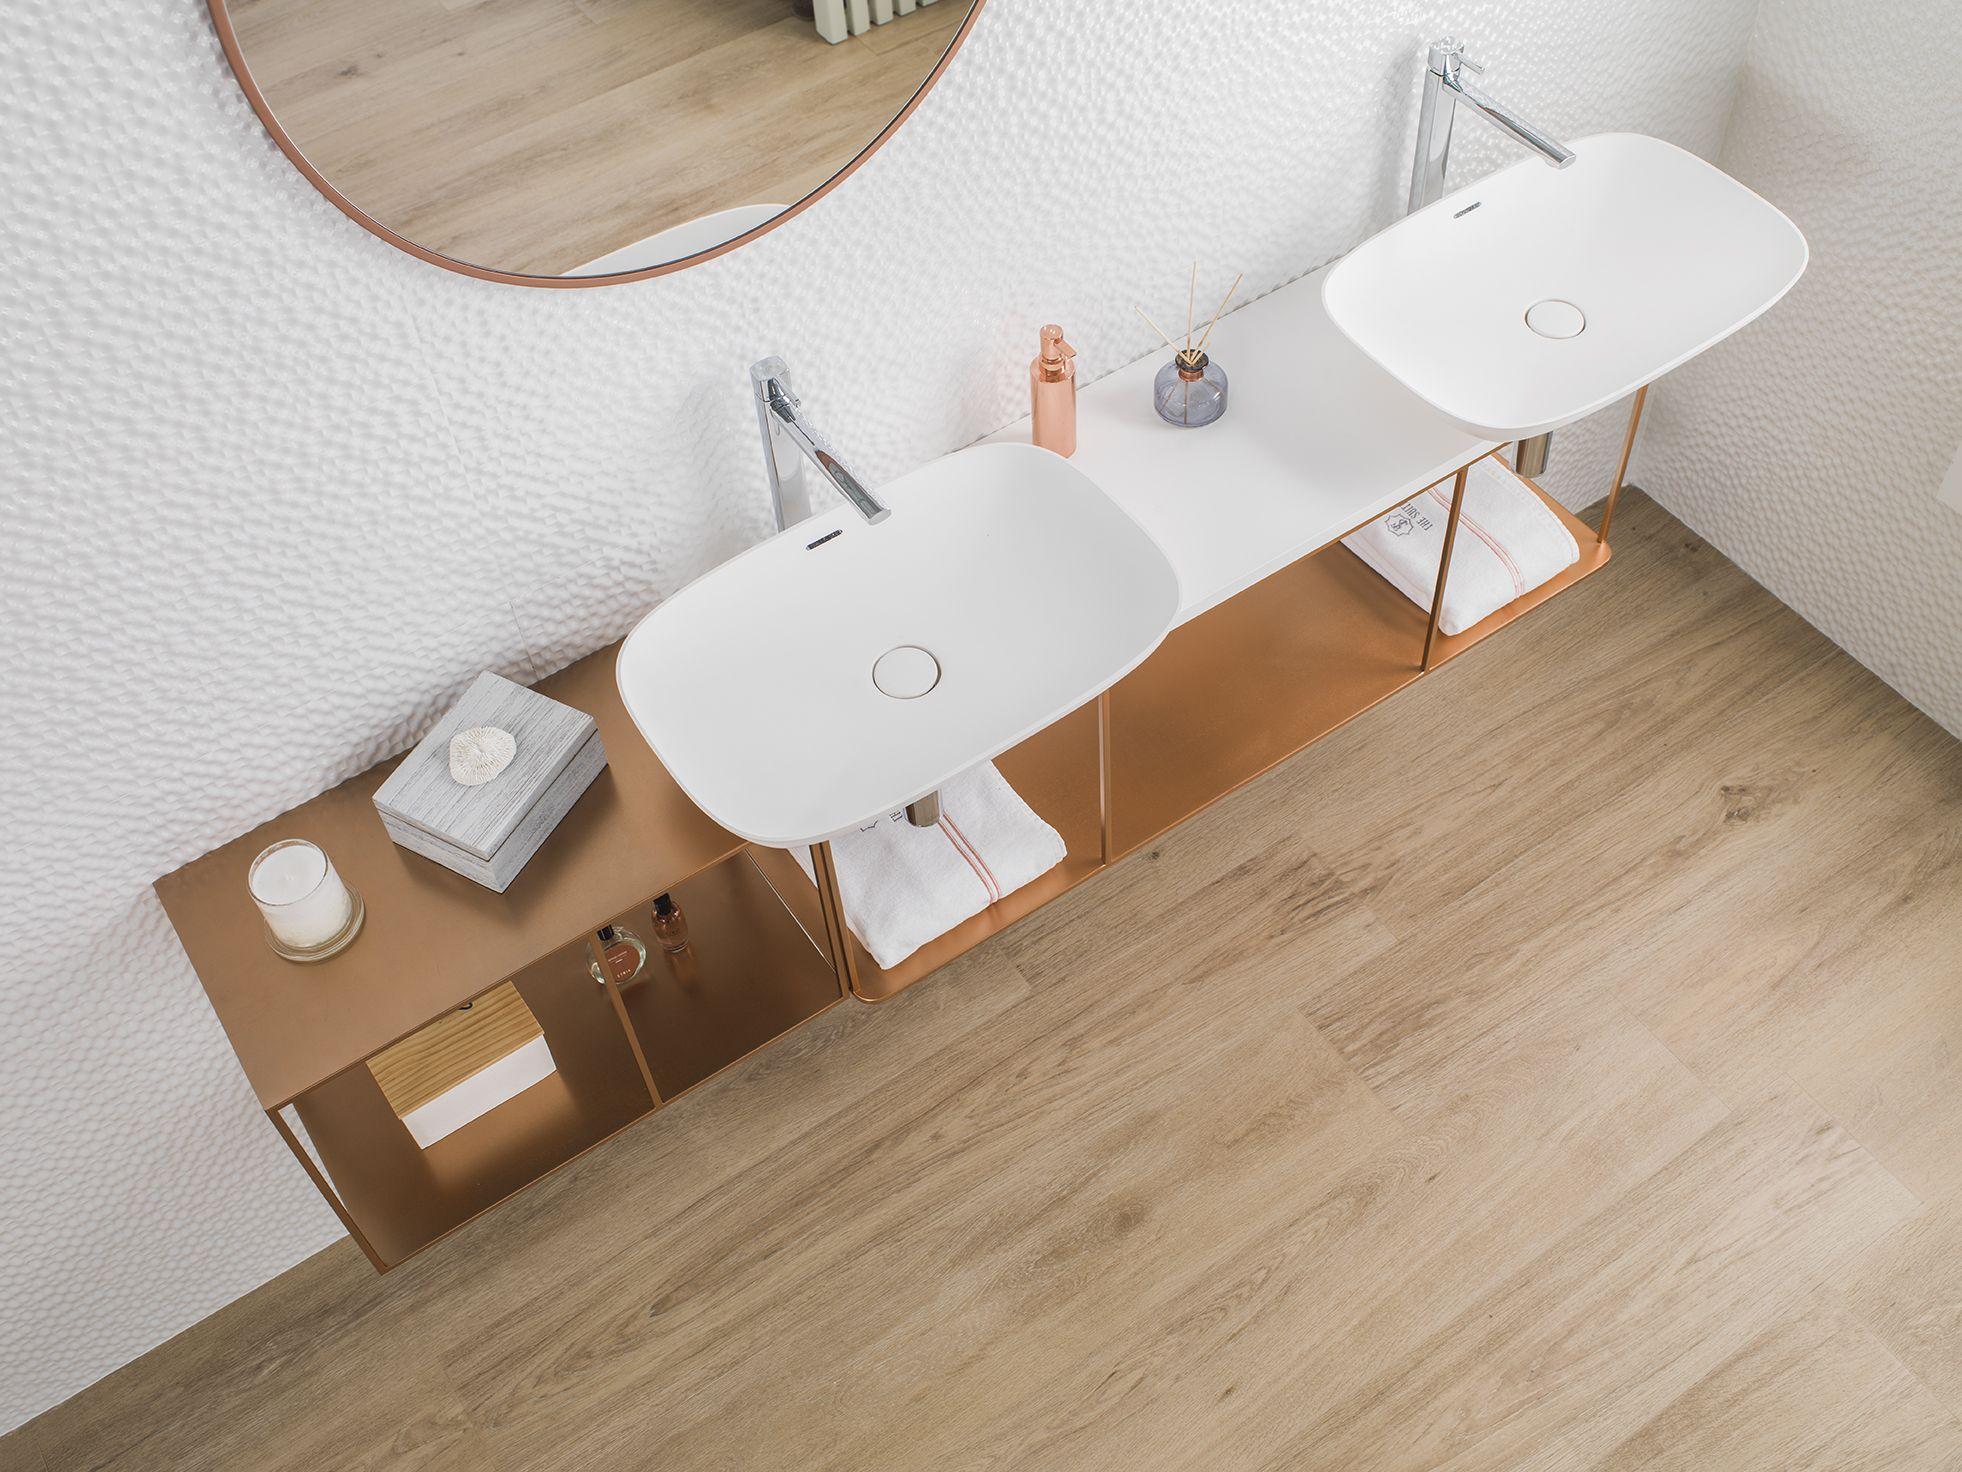 Forum Carrelage Imitation Parquet star-wood | carrelage imitation parquet, parquet, salle de bain